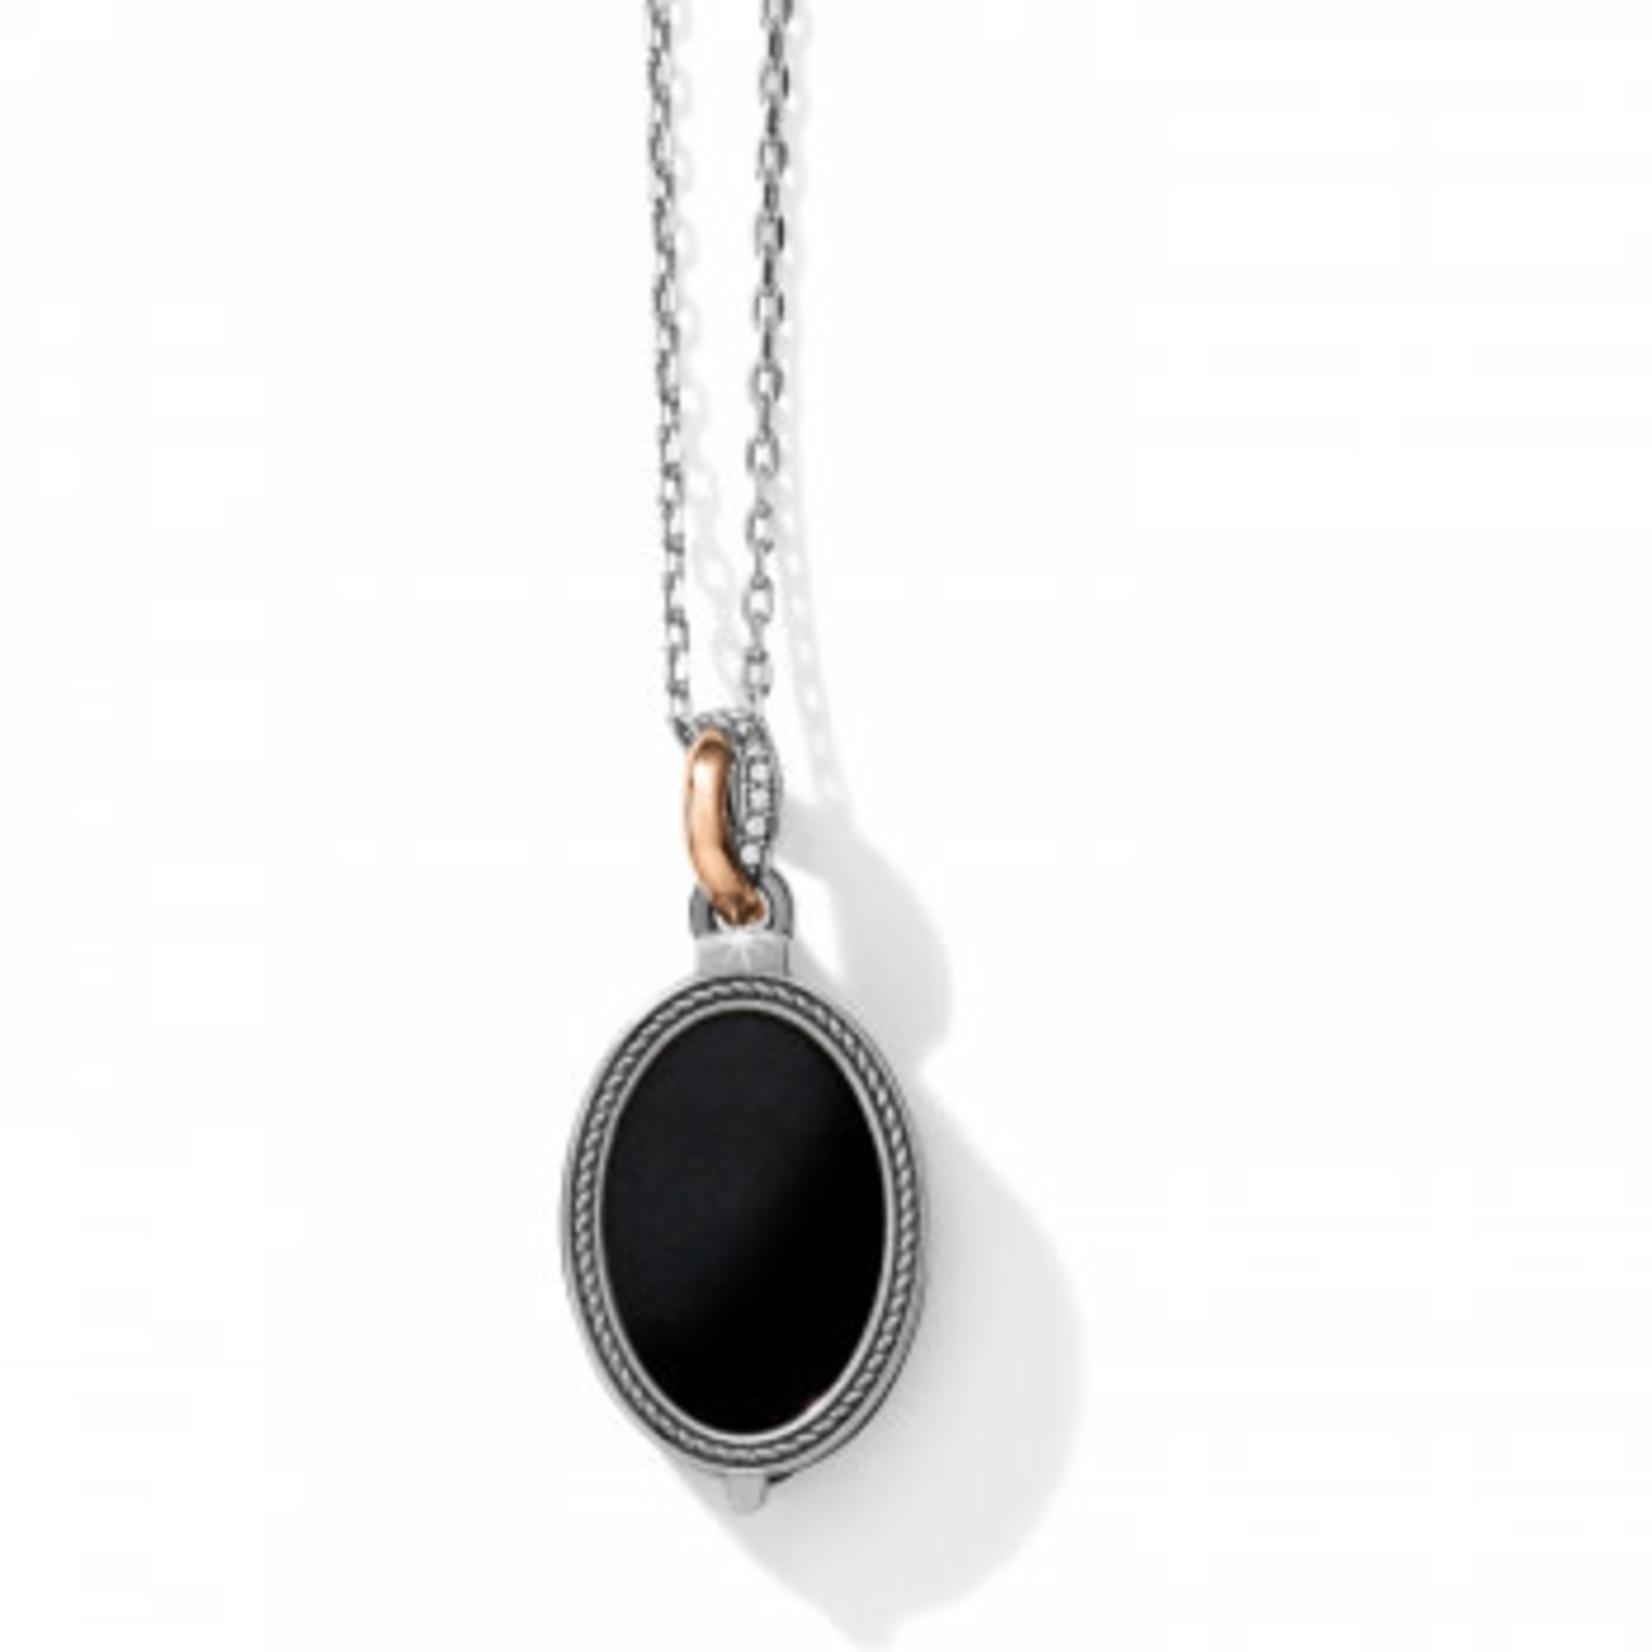 Brighton Neptune's Rings Oval Black Agate Reversible Short Necklace